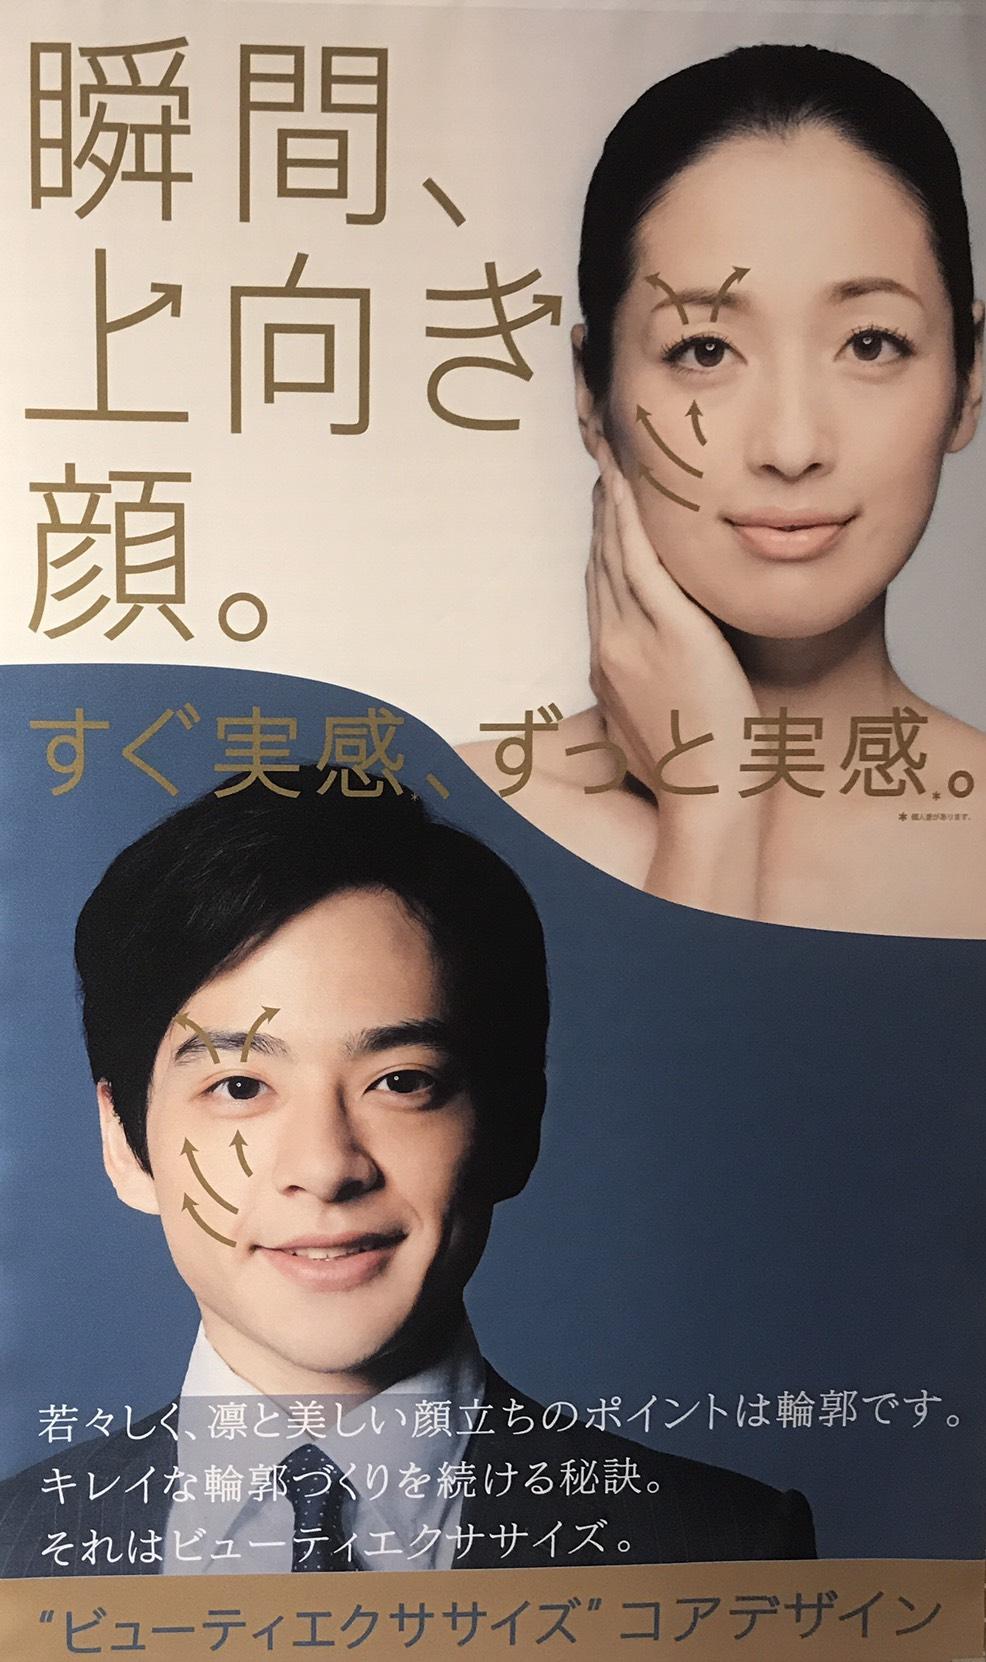 FACEDECO小顔エステサロン所沢美容室の画像